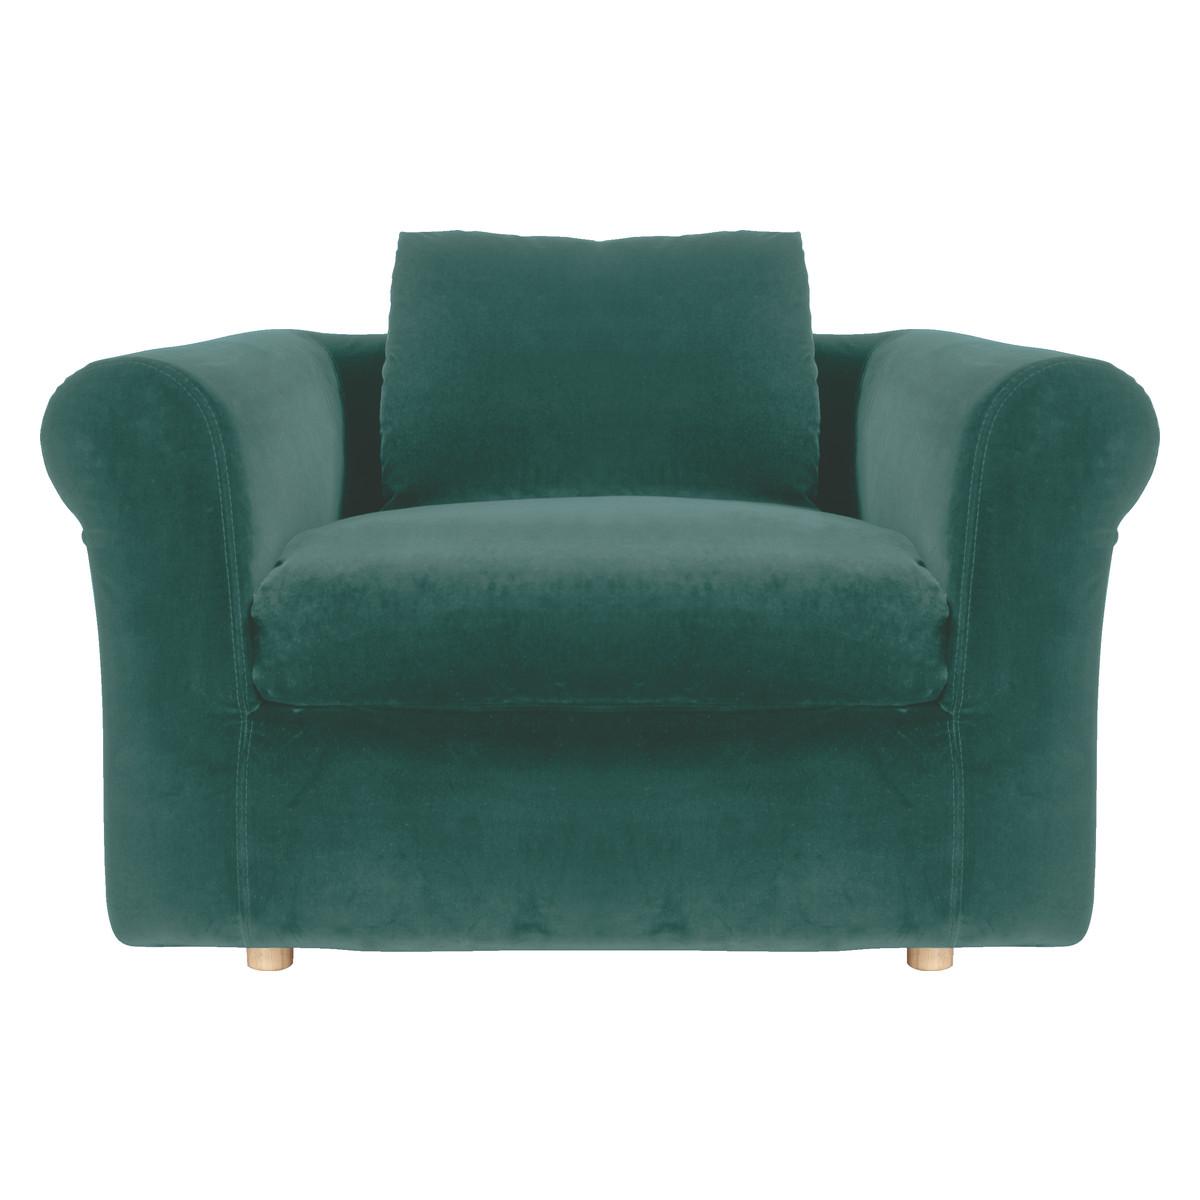 emerald green sofa covers leather natuzzi habitat louis velvet compact bed